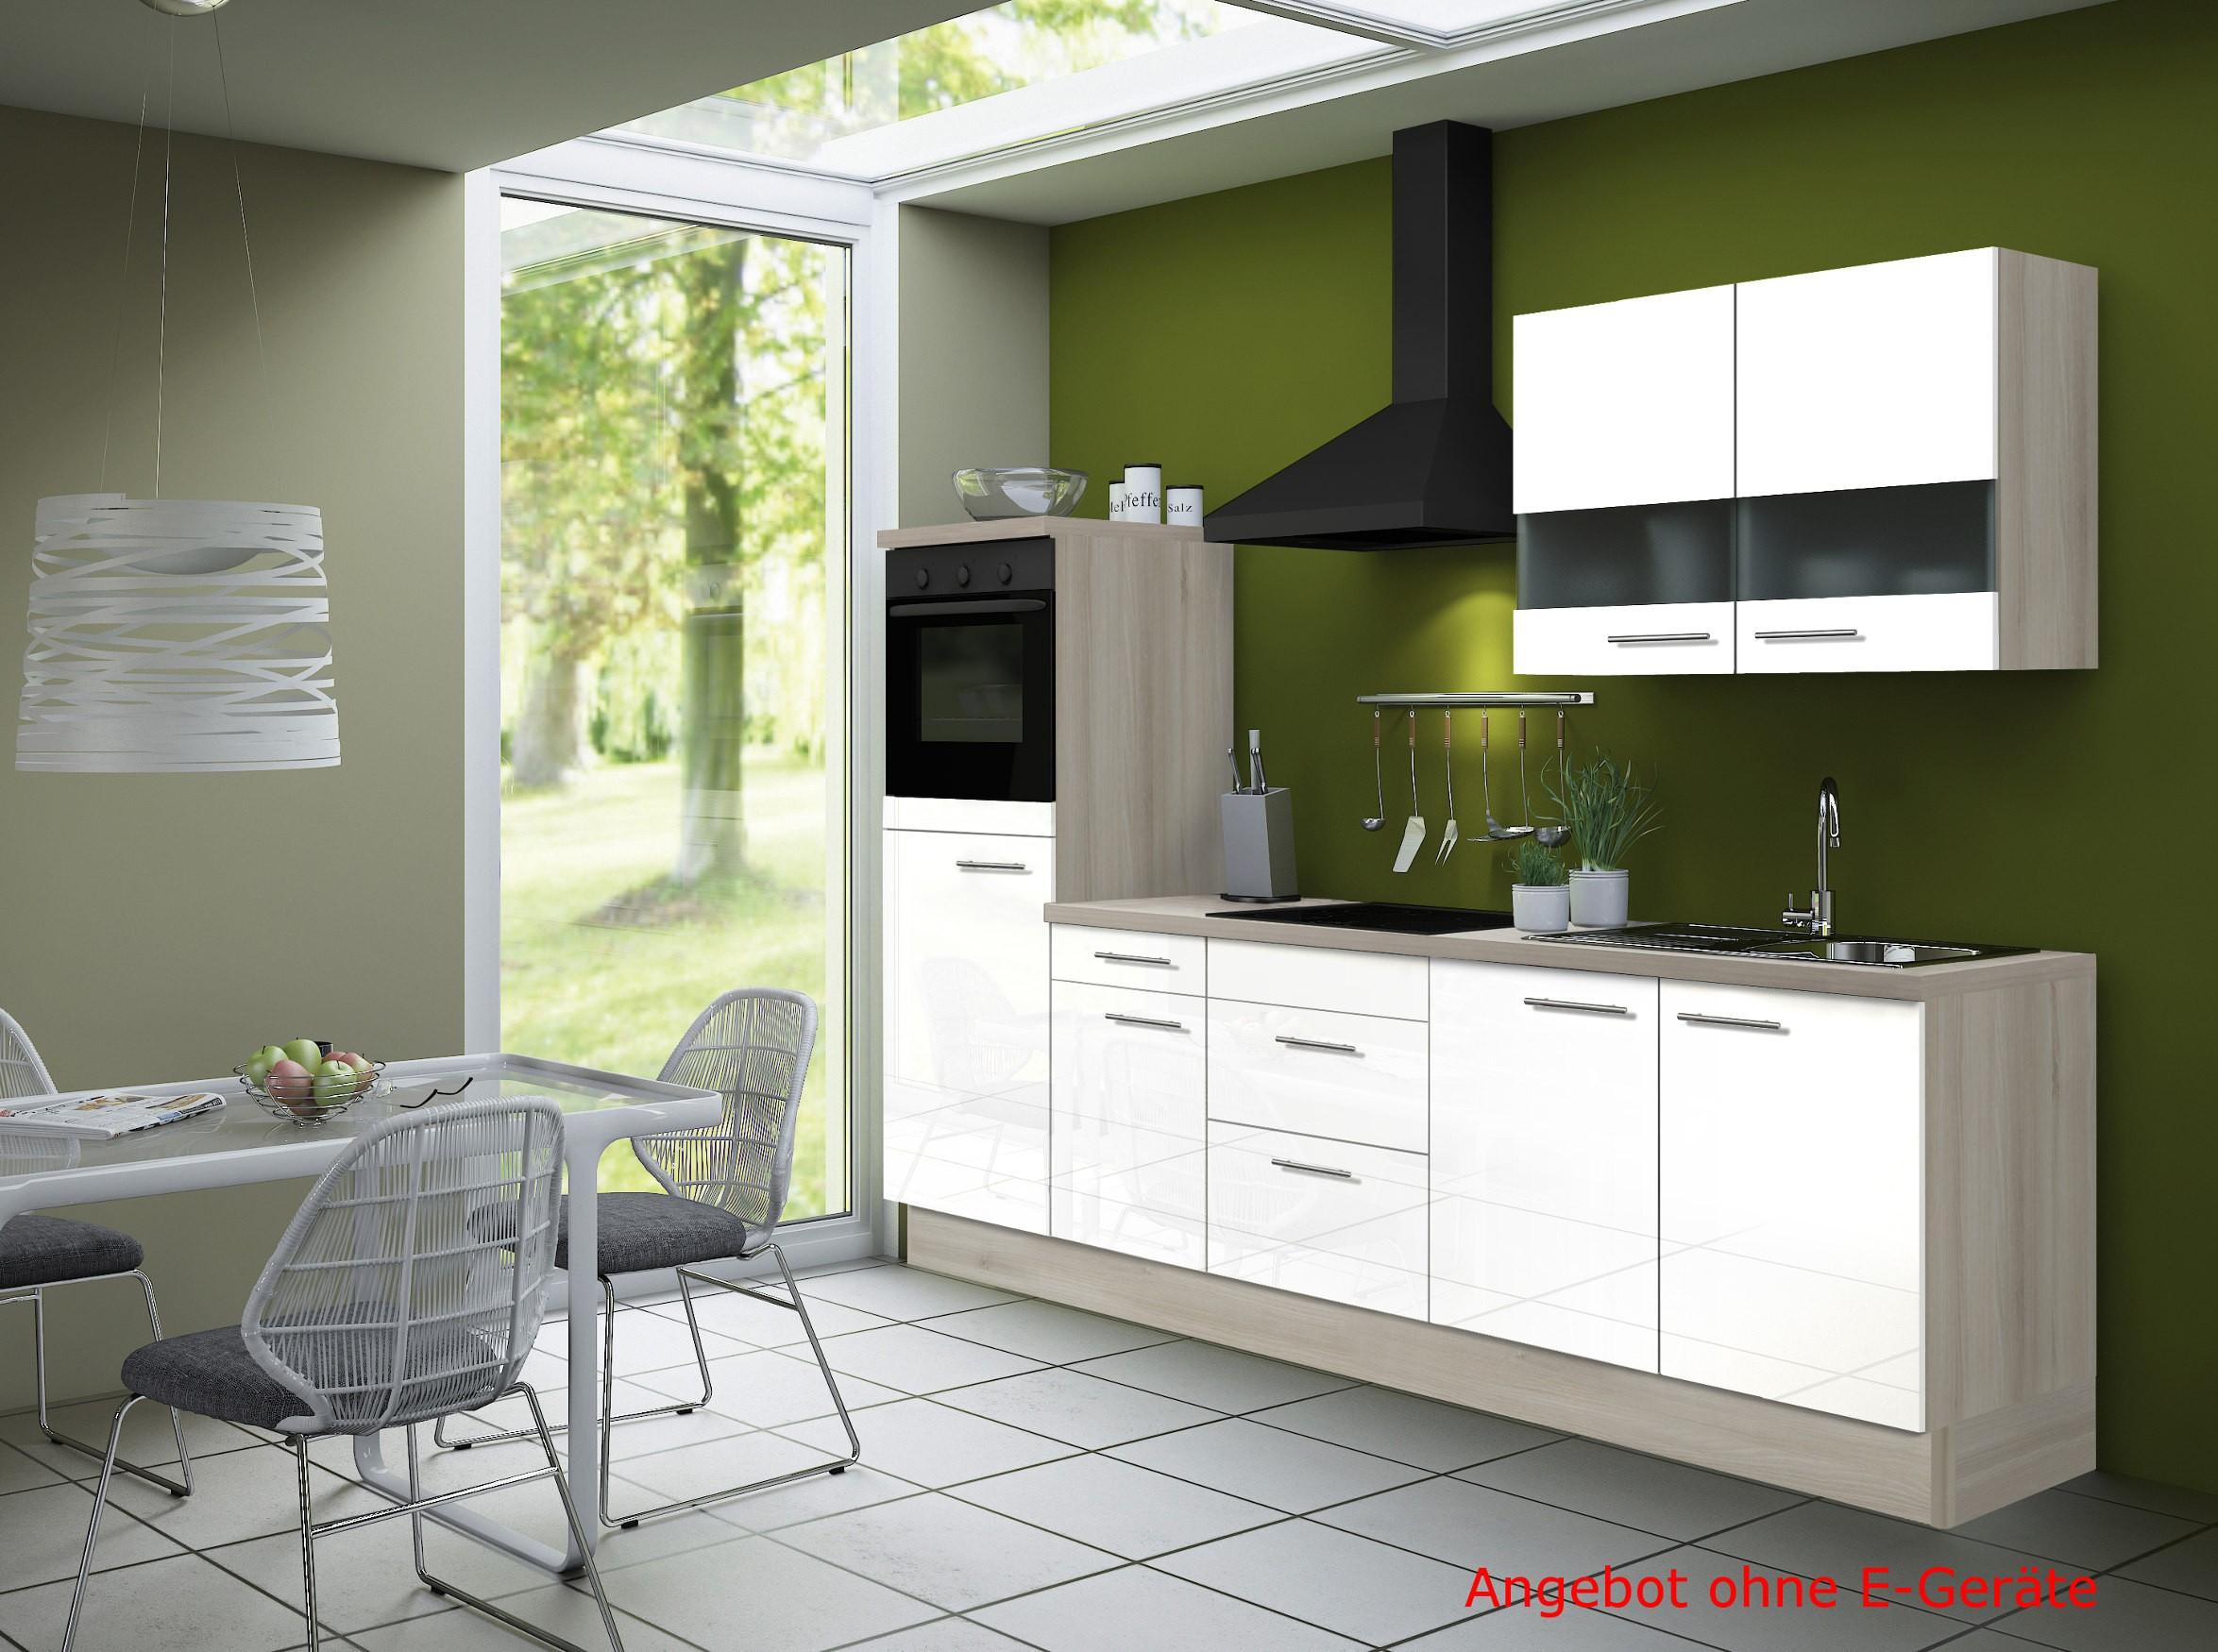 k chenblock leon k chenzeile k che ohne elektro ger te leerzeile 270 cm weiss ebay. Black Bedroom Furniture Sets. Home Design Ideas